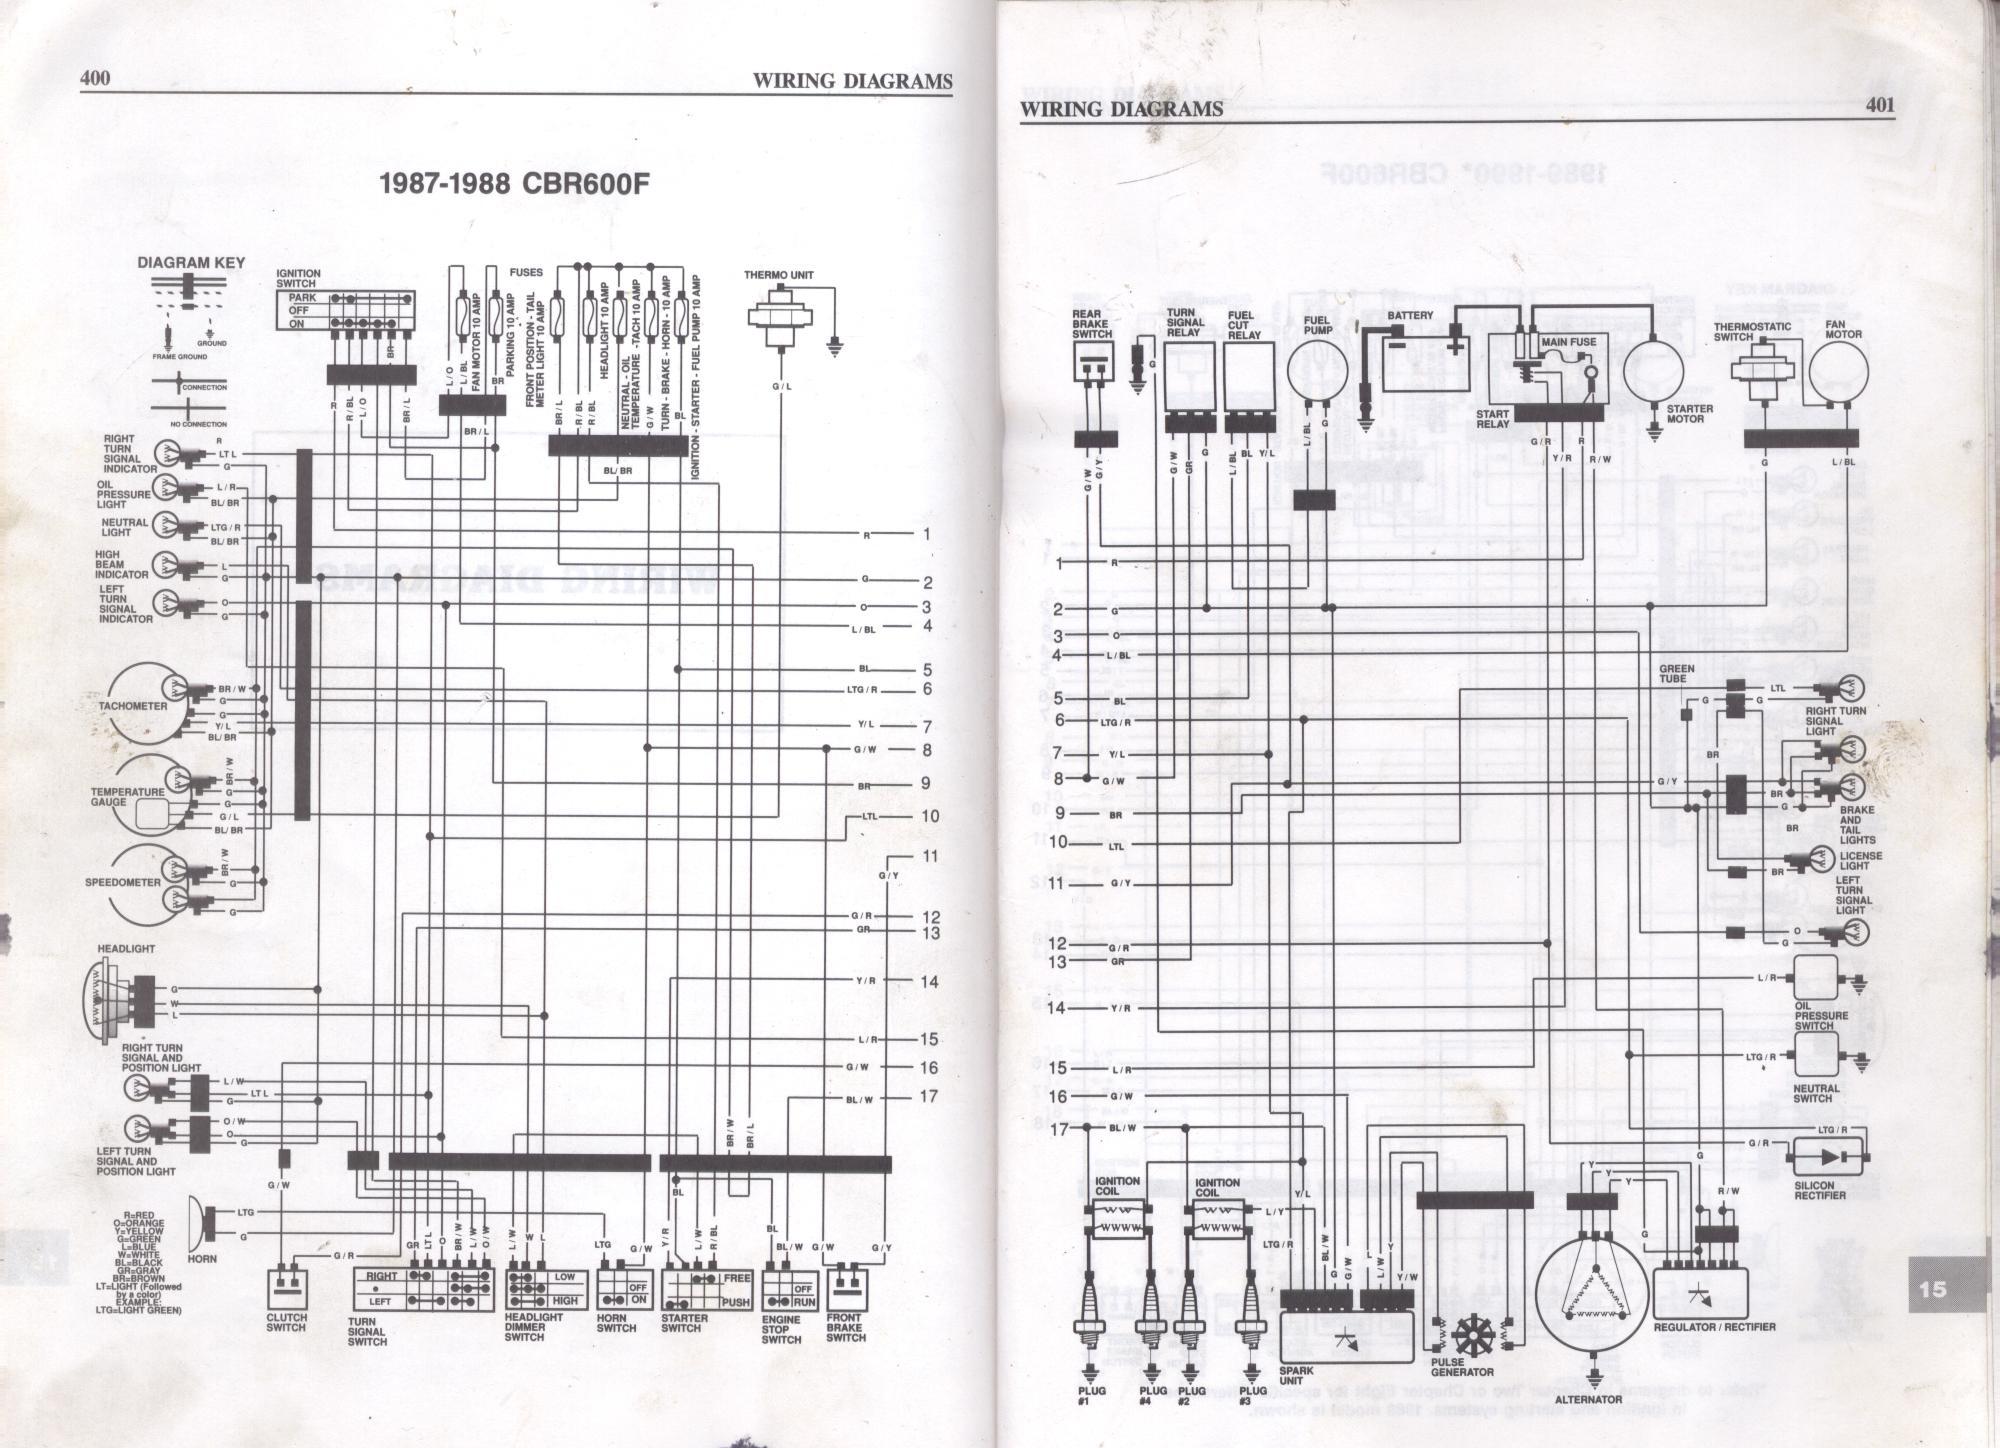 1987 1988 Honda CBR600F Wiring Diagrams?resize\=665%2C481 s i1 wp com www cyclechaos com images 0 0e 1 virago wiring diagram at soozxer.org